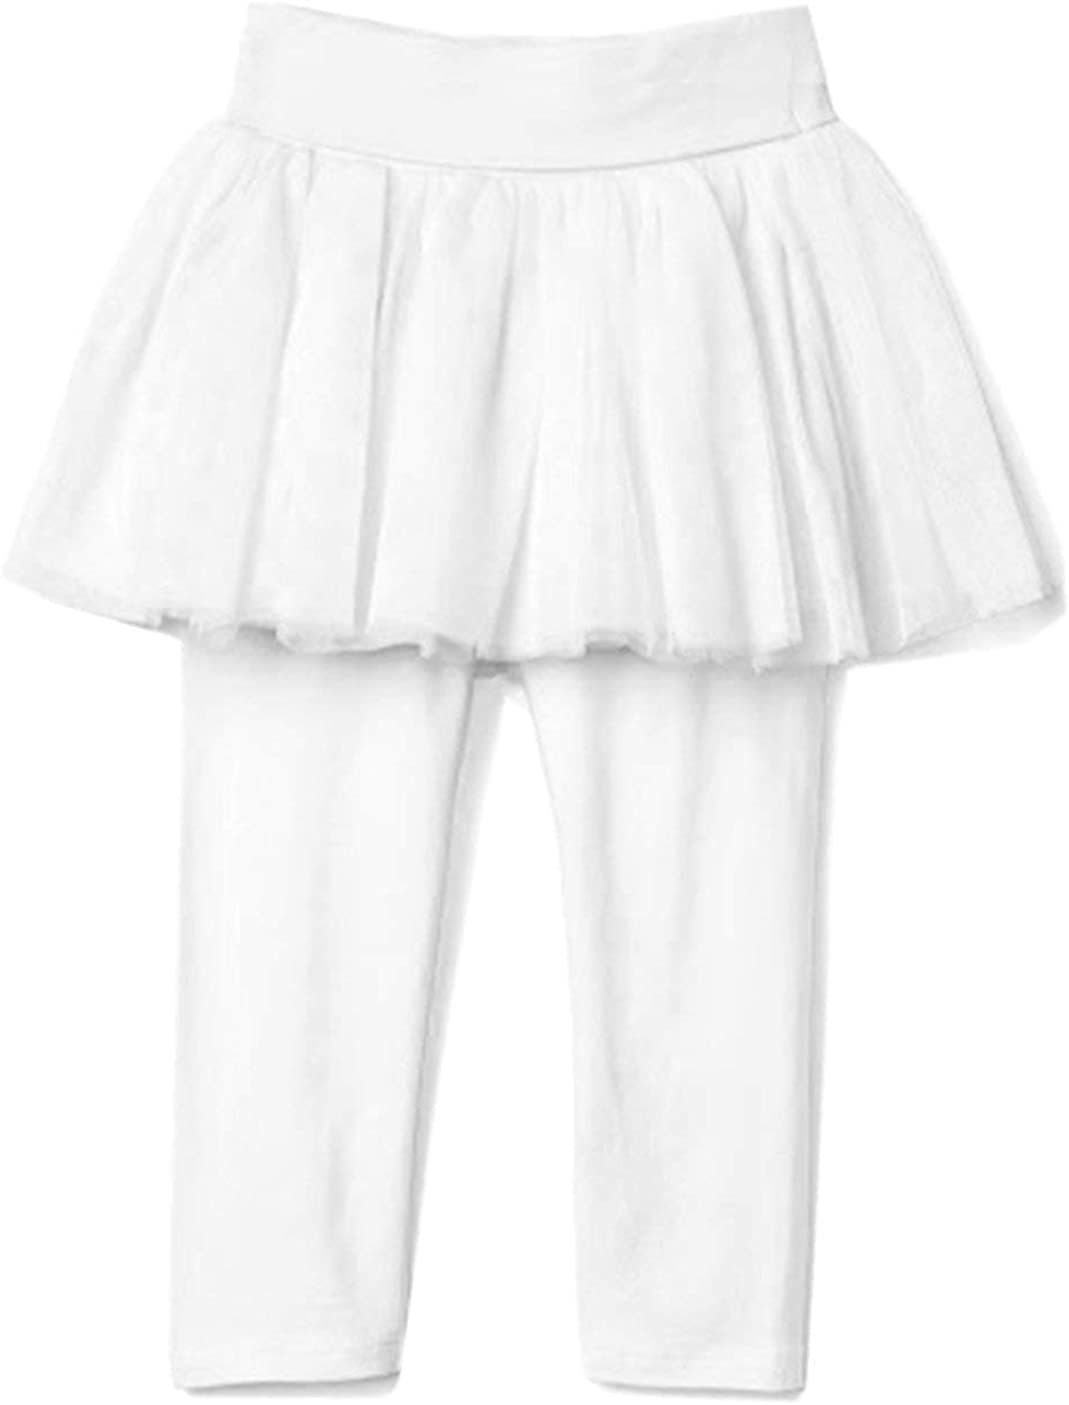 StylesILove Toddler Minneapolis Mall Girl Max 64% OFF Soft Legging Pants Tutu